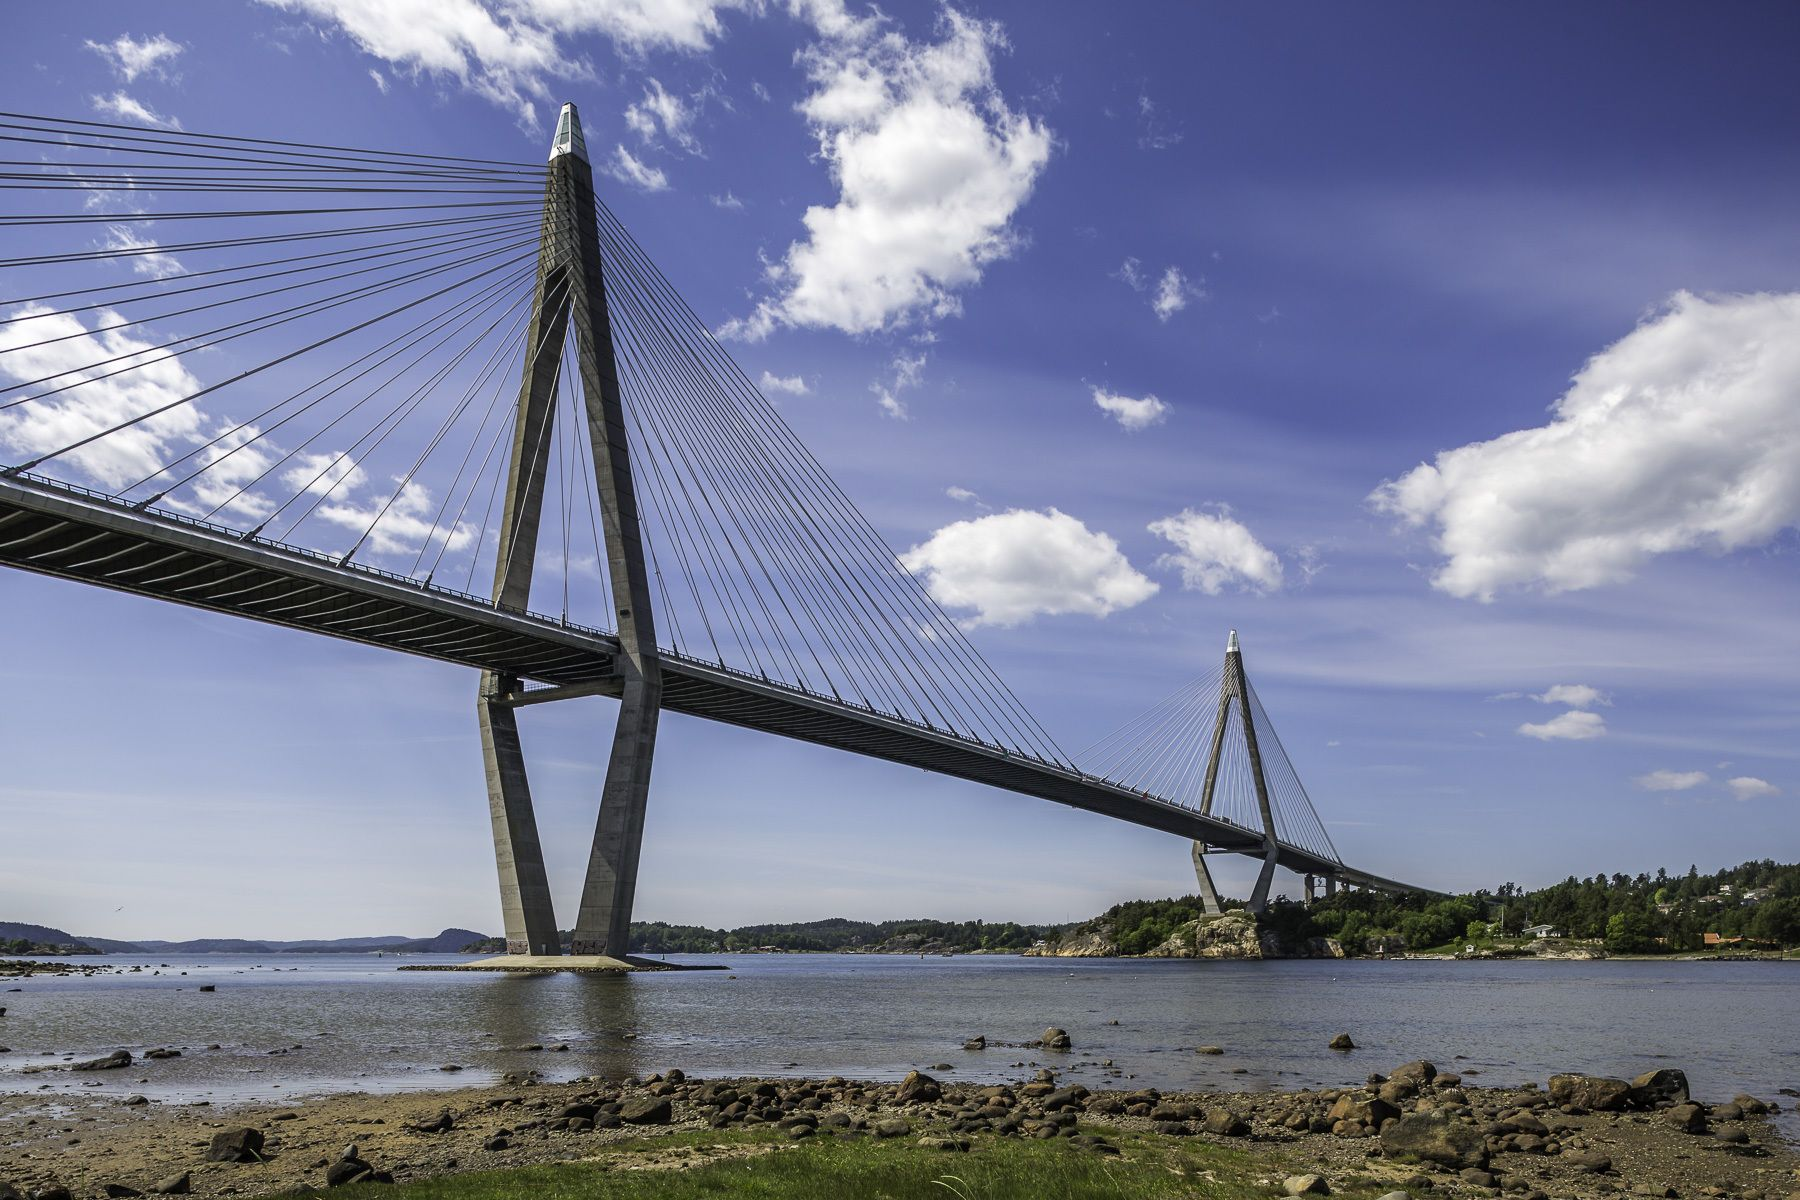 Uddevallabron – Uddevalla Bridge http://mabrycampbell.com #image #photo #Sweden #bridge #Uddevalla #bridge #archipelago #water